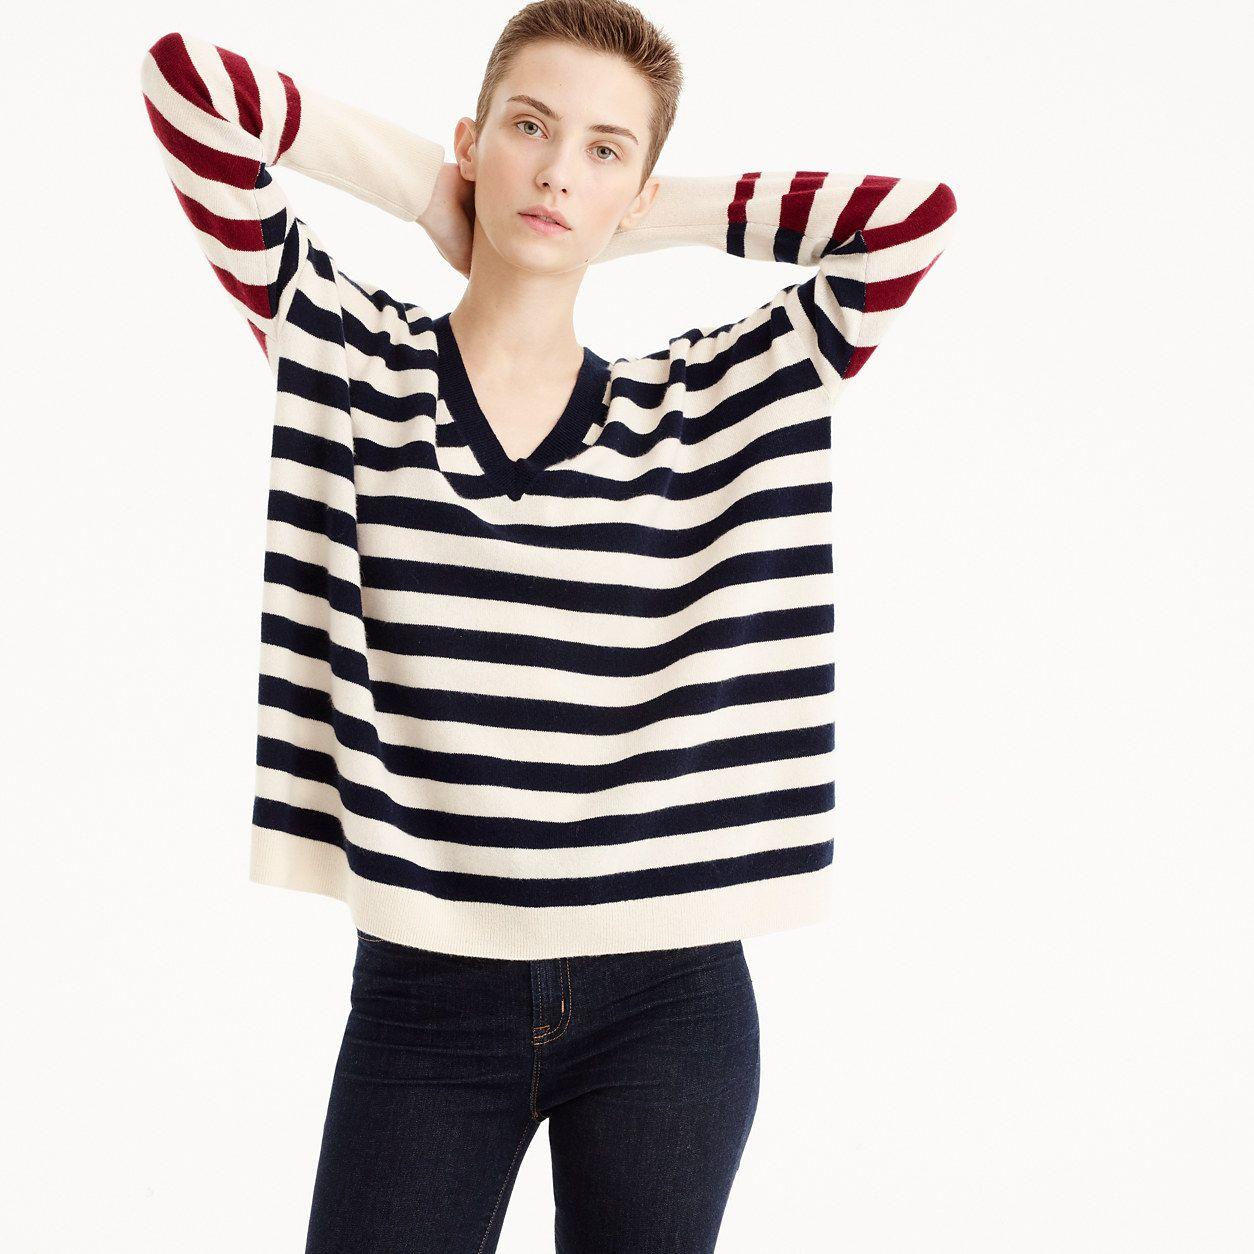 7792db2c8765 J.Crew Womens V-Neck Boyfriend Striped Sweater In Everyday Cashmere ...